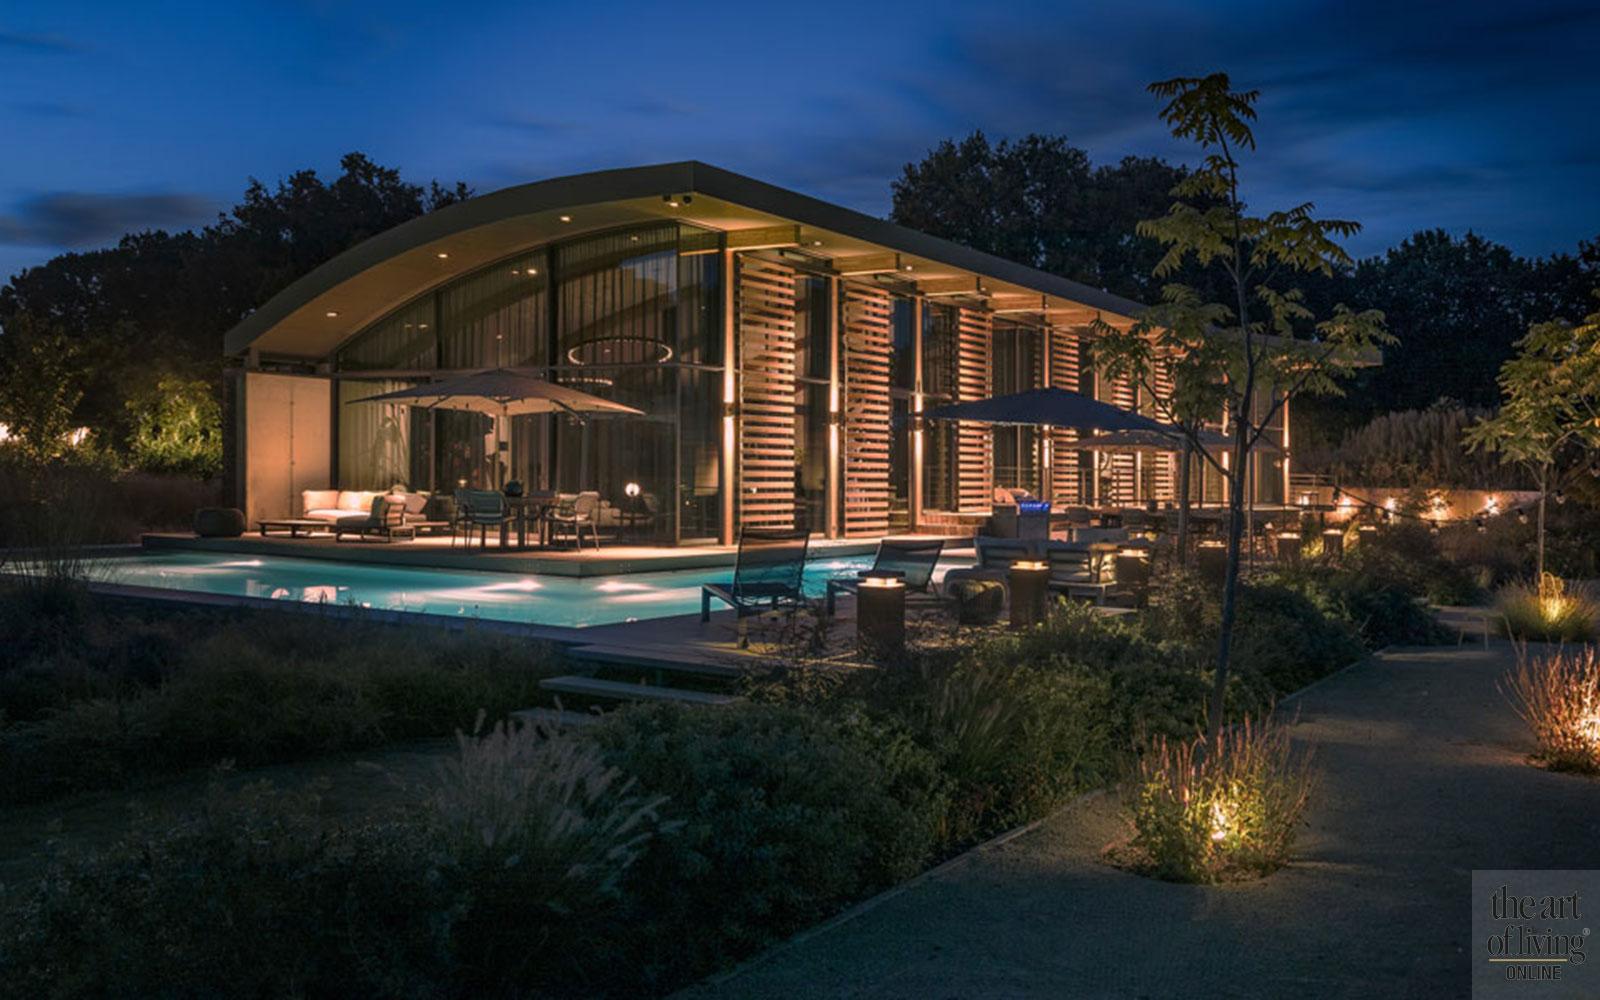 architectuurstijlen, luxe villa, villabouw, villa stijl, moderne villa